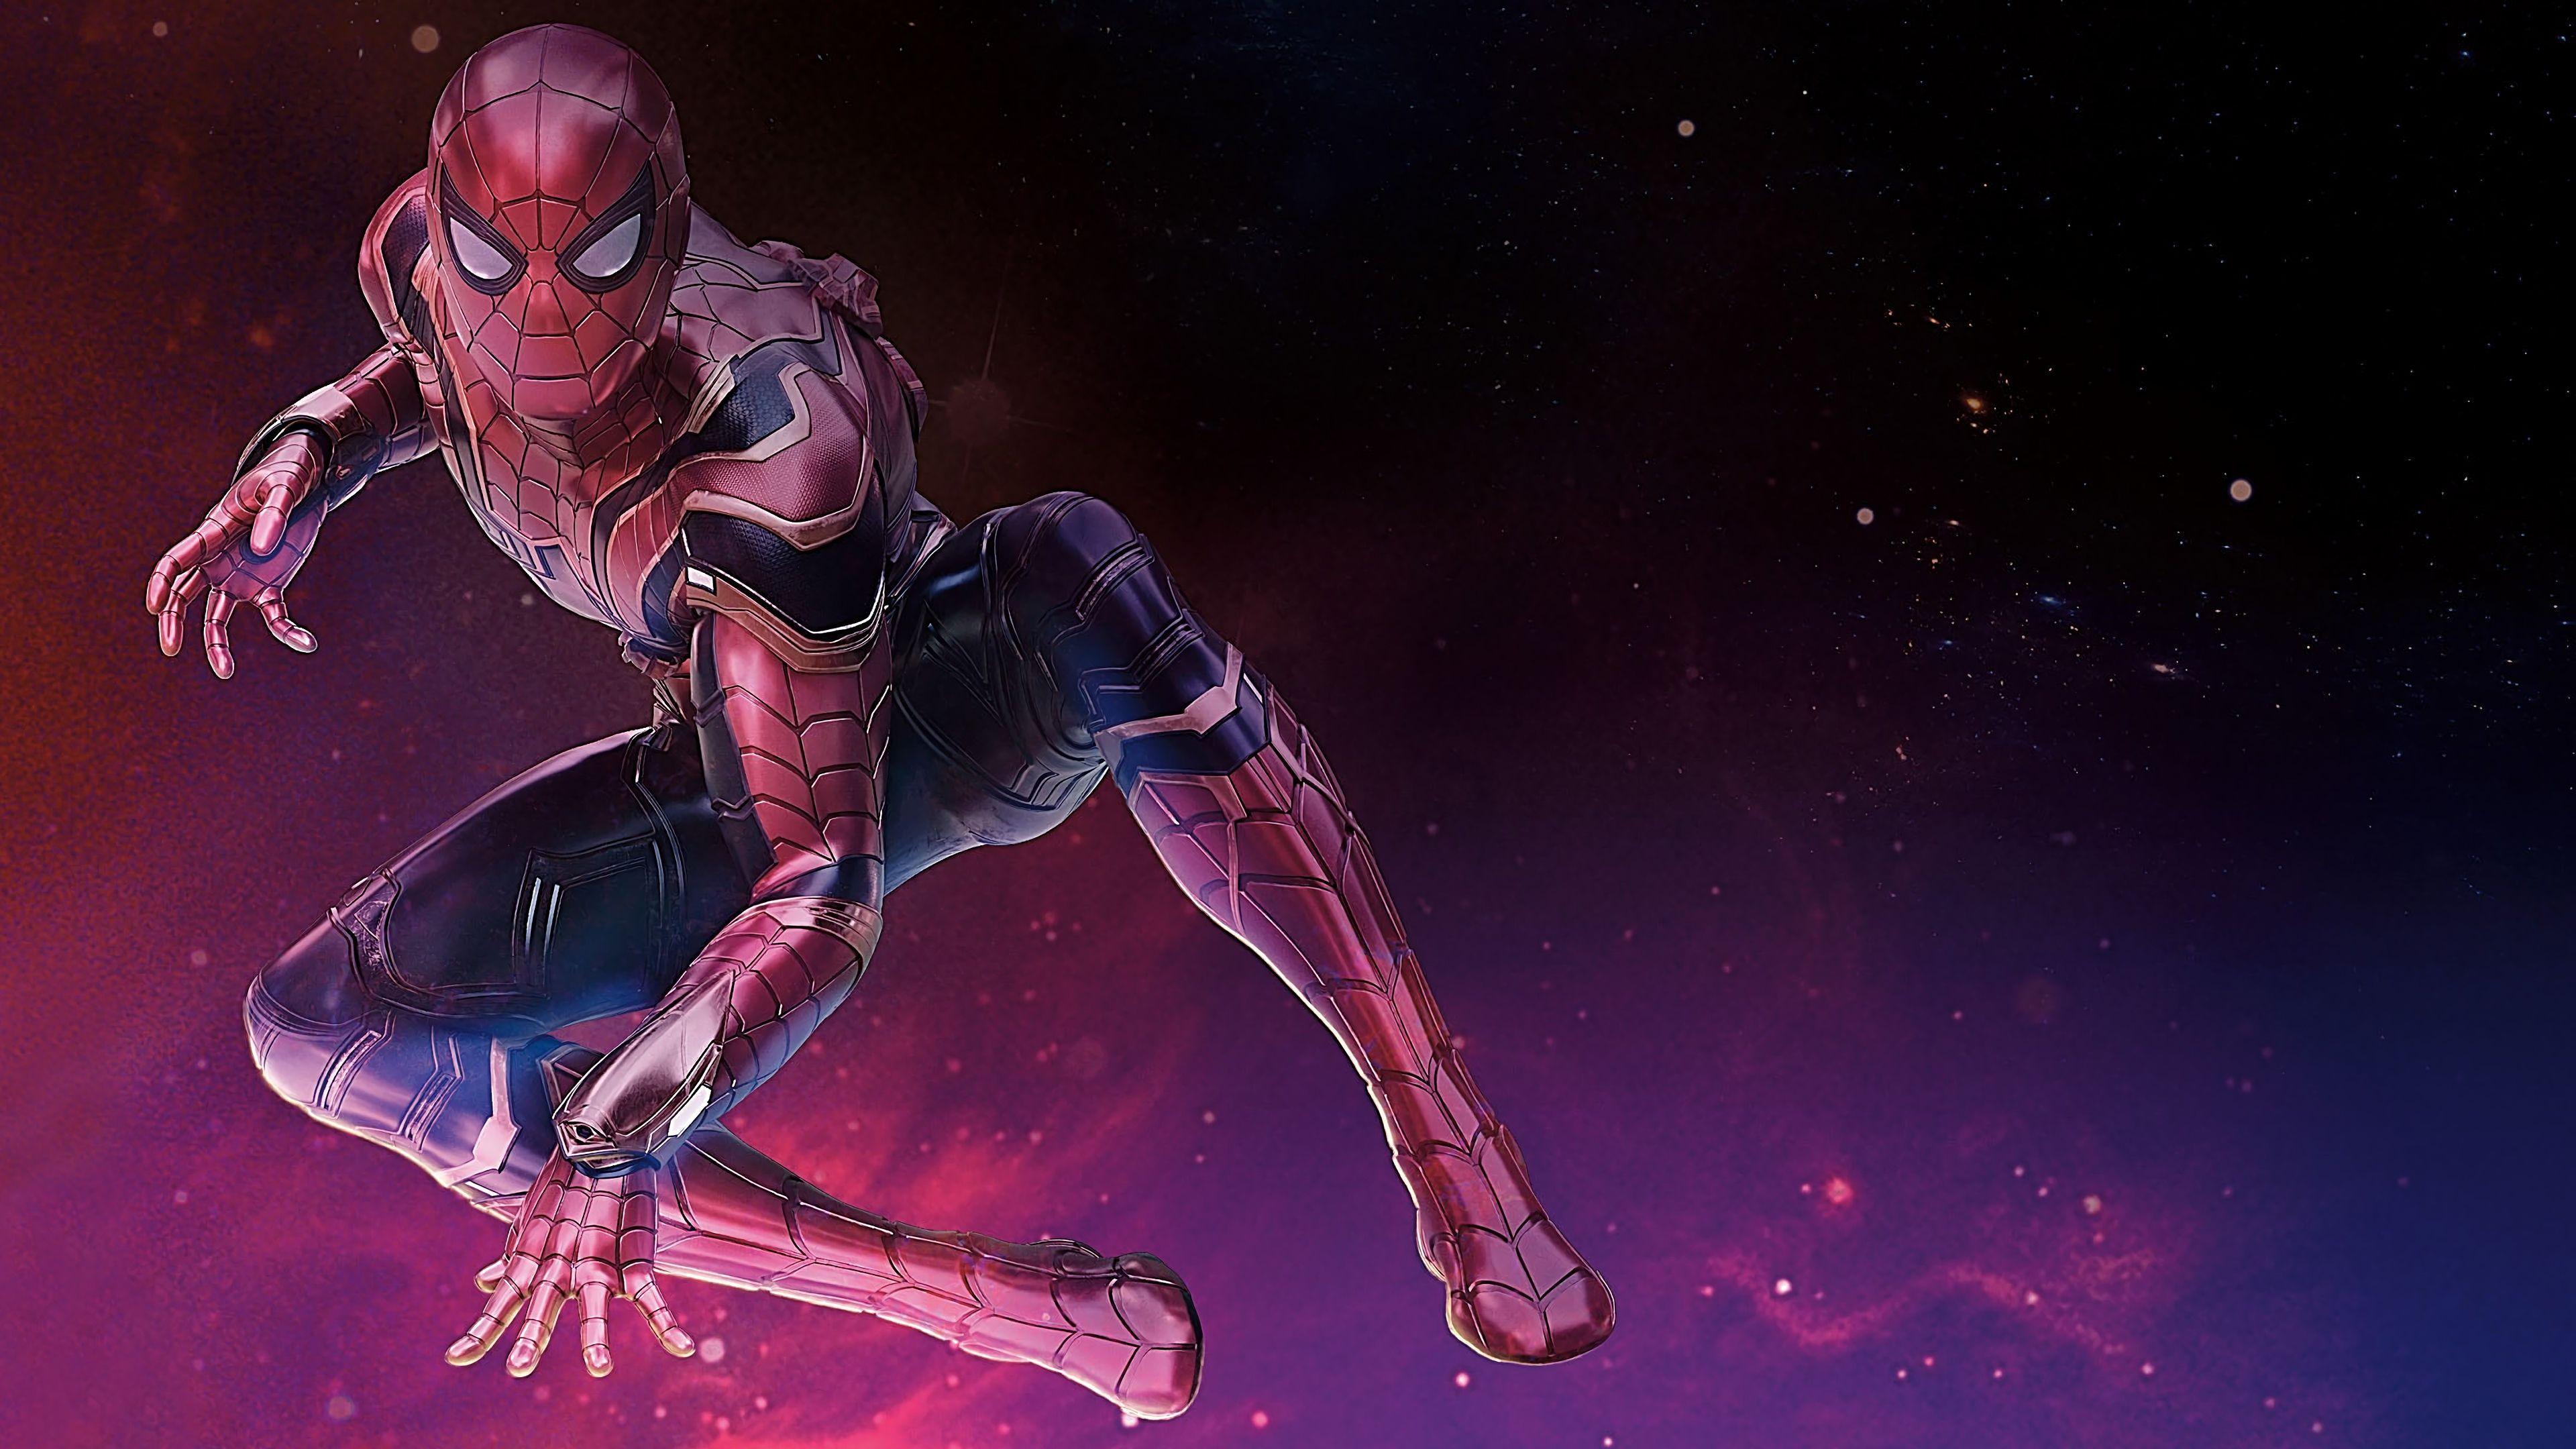 Avengers Infinity War 4k Wallpapers Top Free Avengers Infinity War